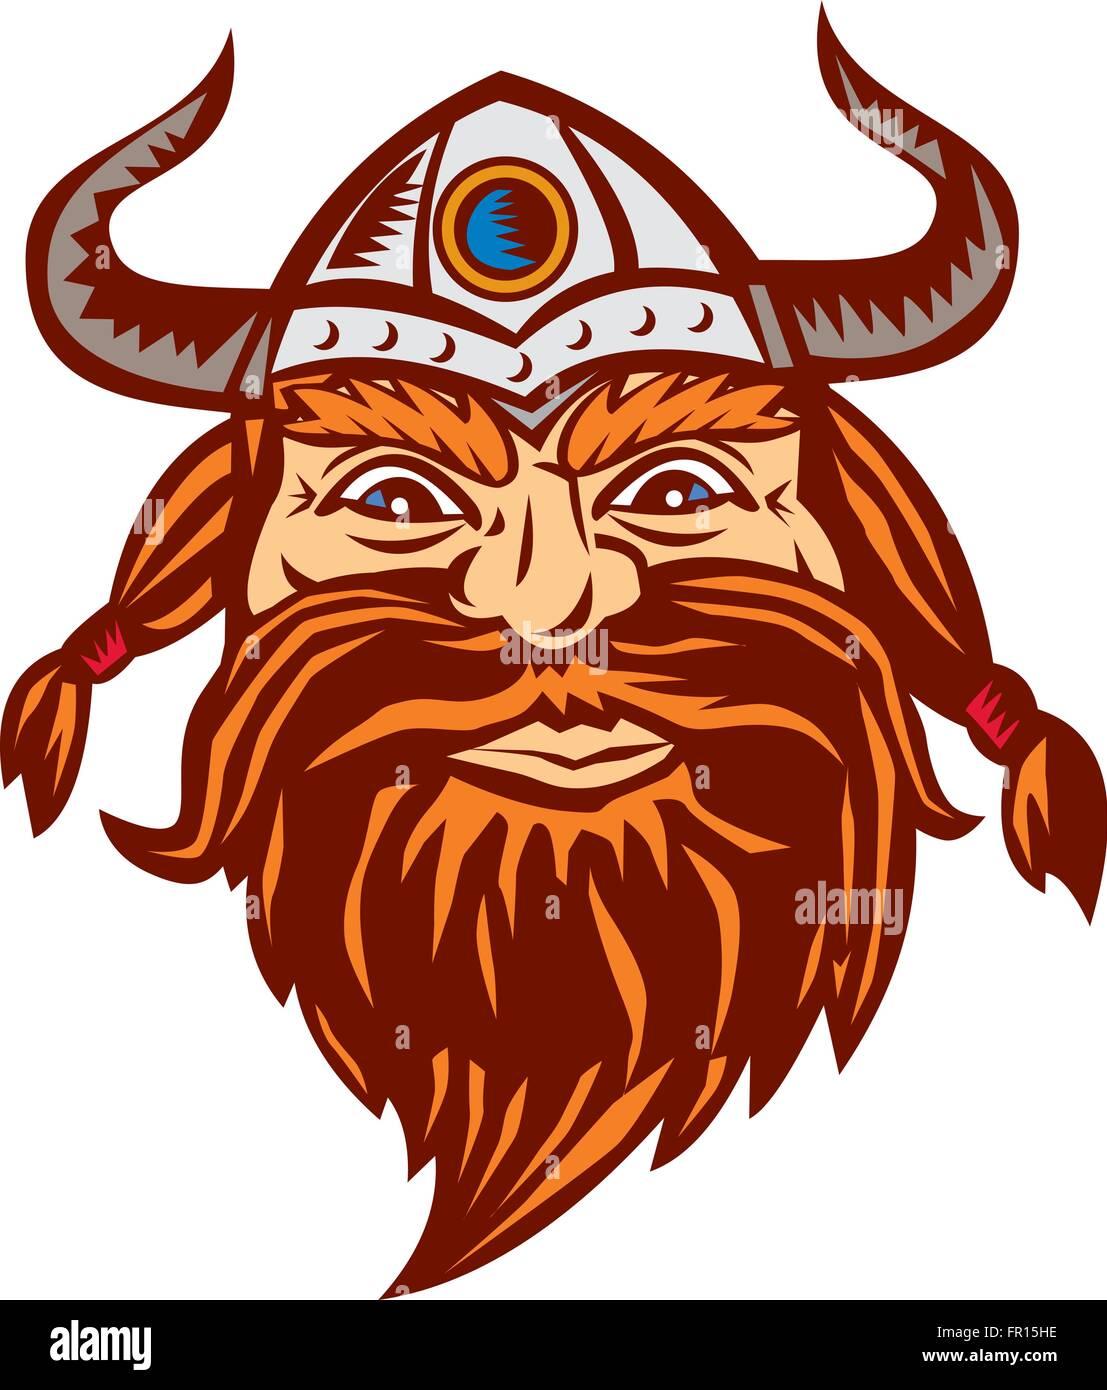 illustration of a head of a norseman viking warrior raider